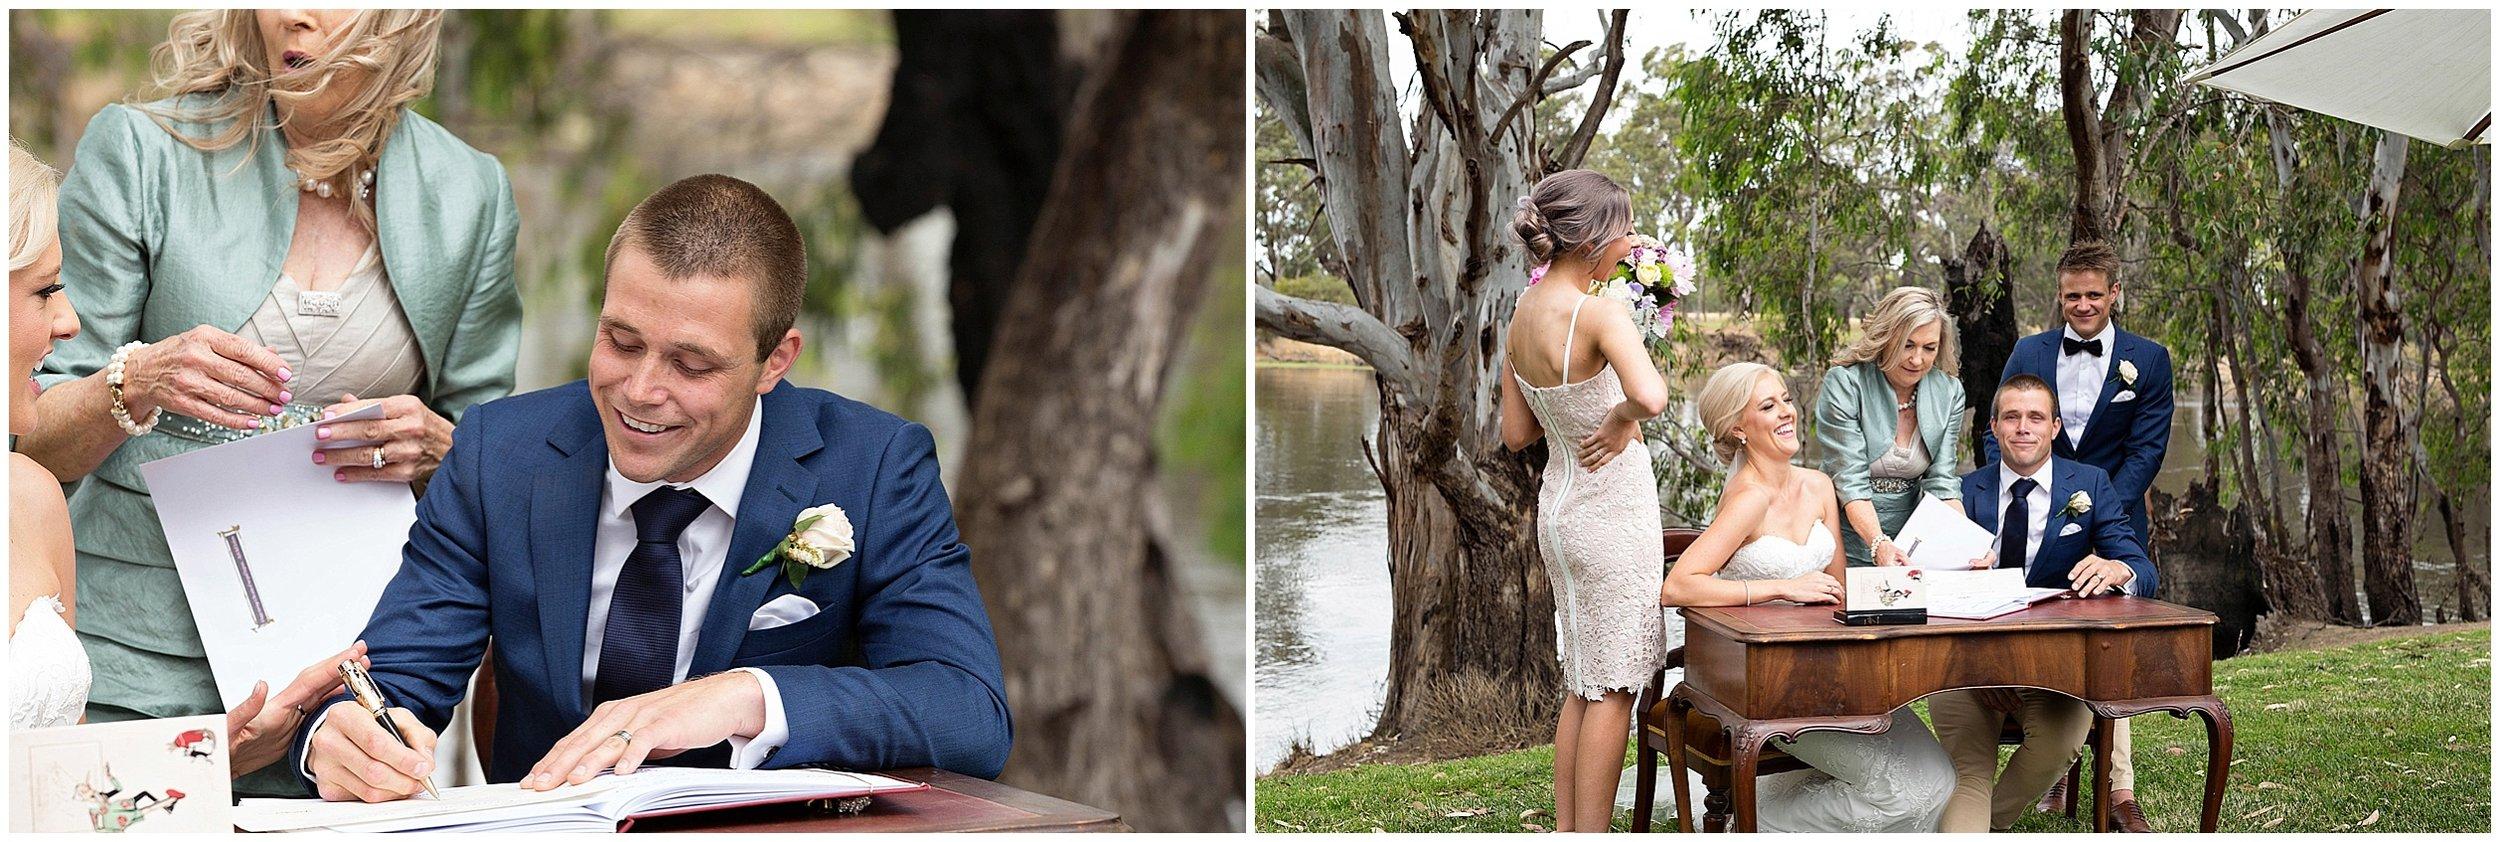 shepparton-wedding-photographer_0200.jpg